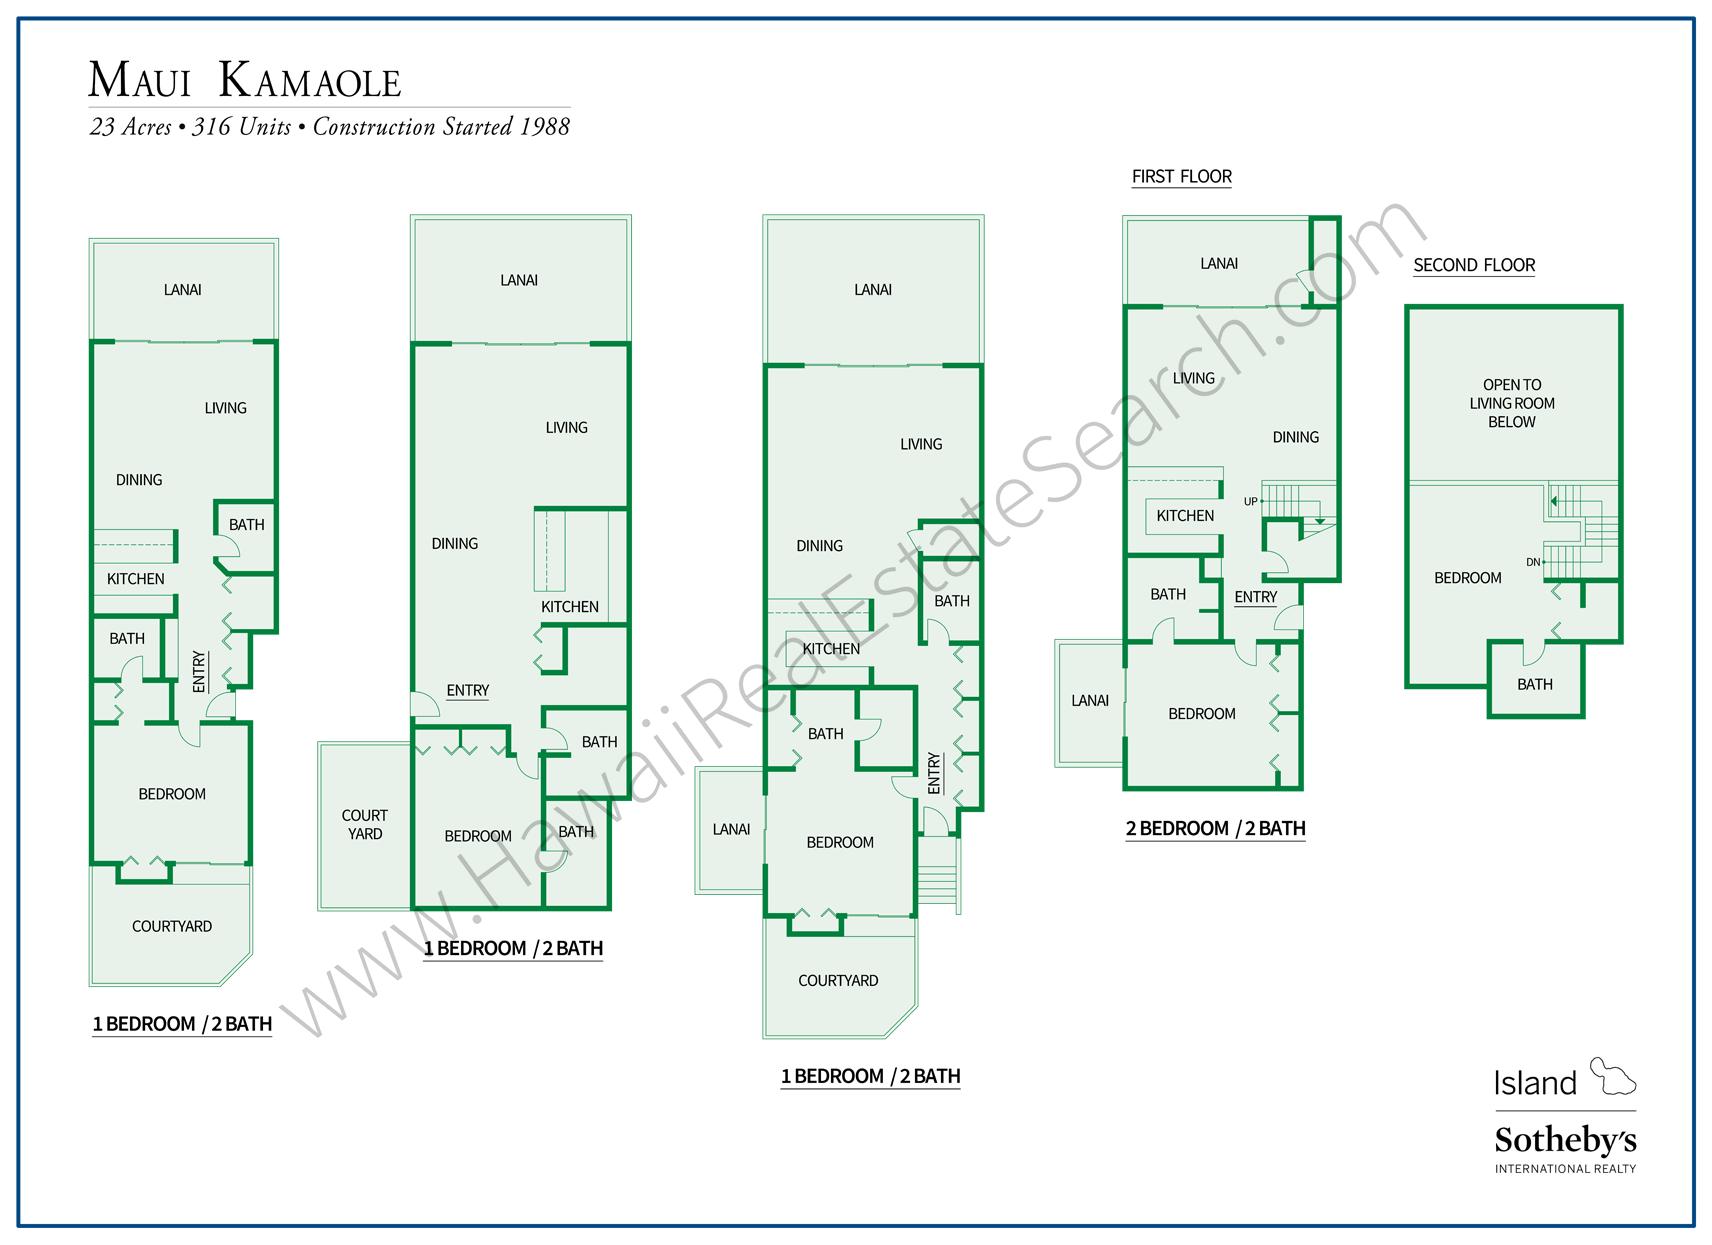 Maui Kamaole Condos For Sale Kihei Real Estate Maui